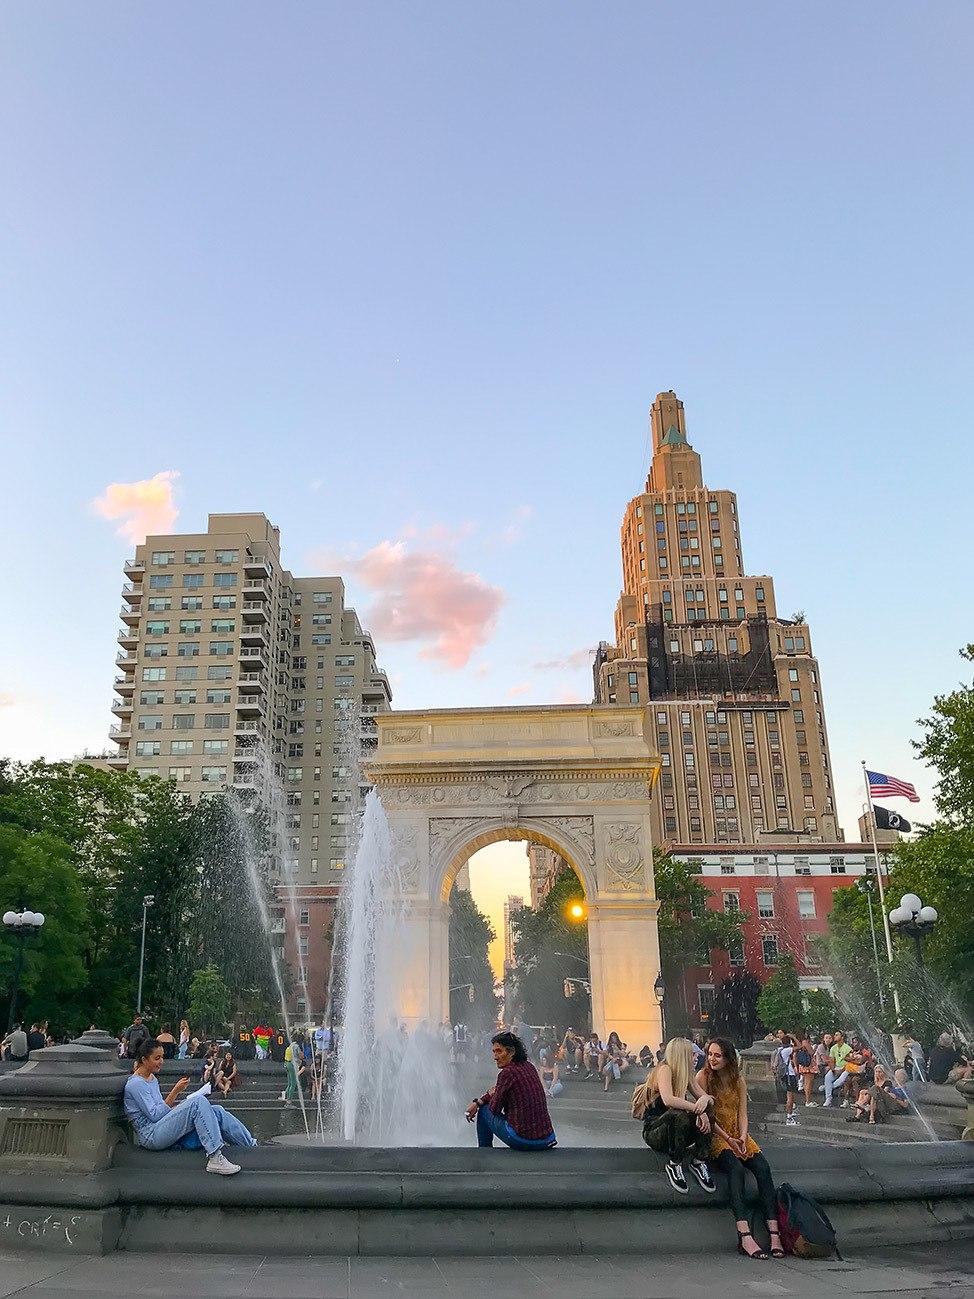 Sunset in Washington Square Park